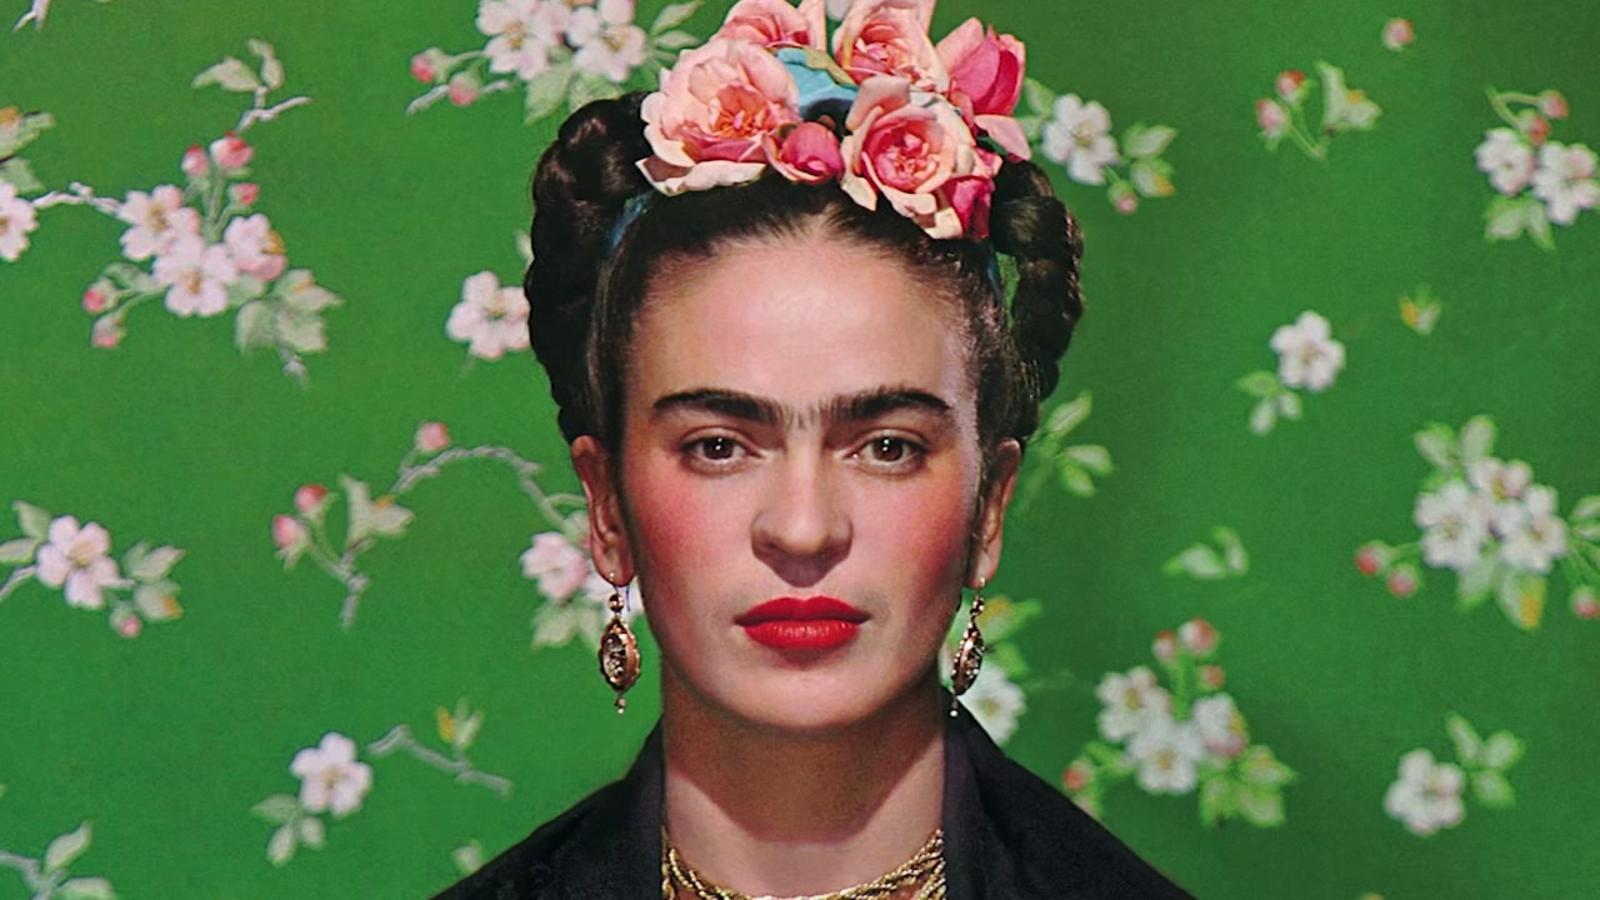 Coronavirus impact: Behind-the-scenes look at Frida Kahlo exhibit at San Francisco's de Young Museum - ABC7 San Francisco